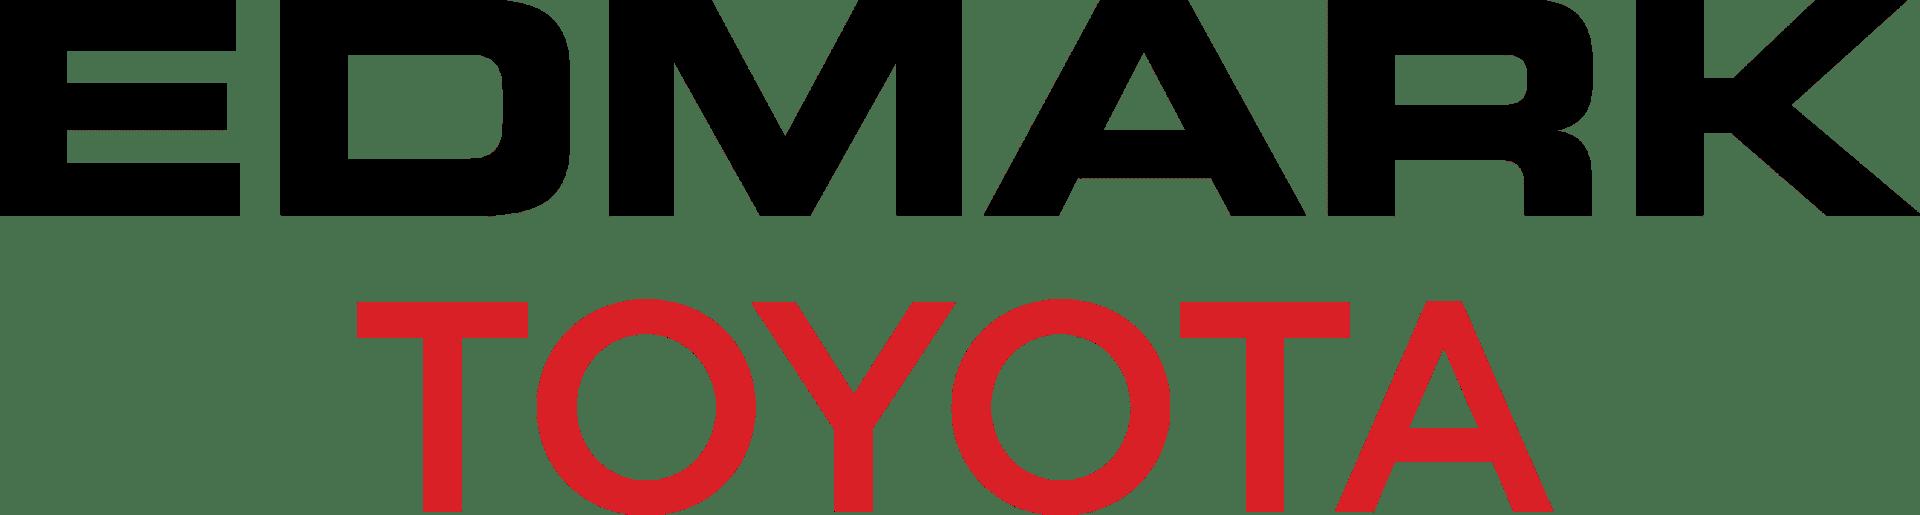 Edmark-Toyota.png